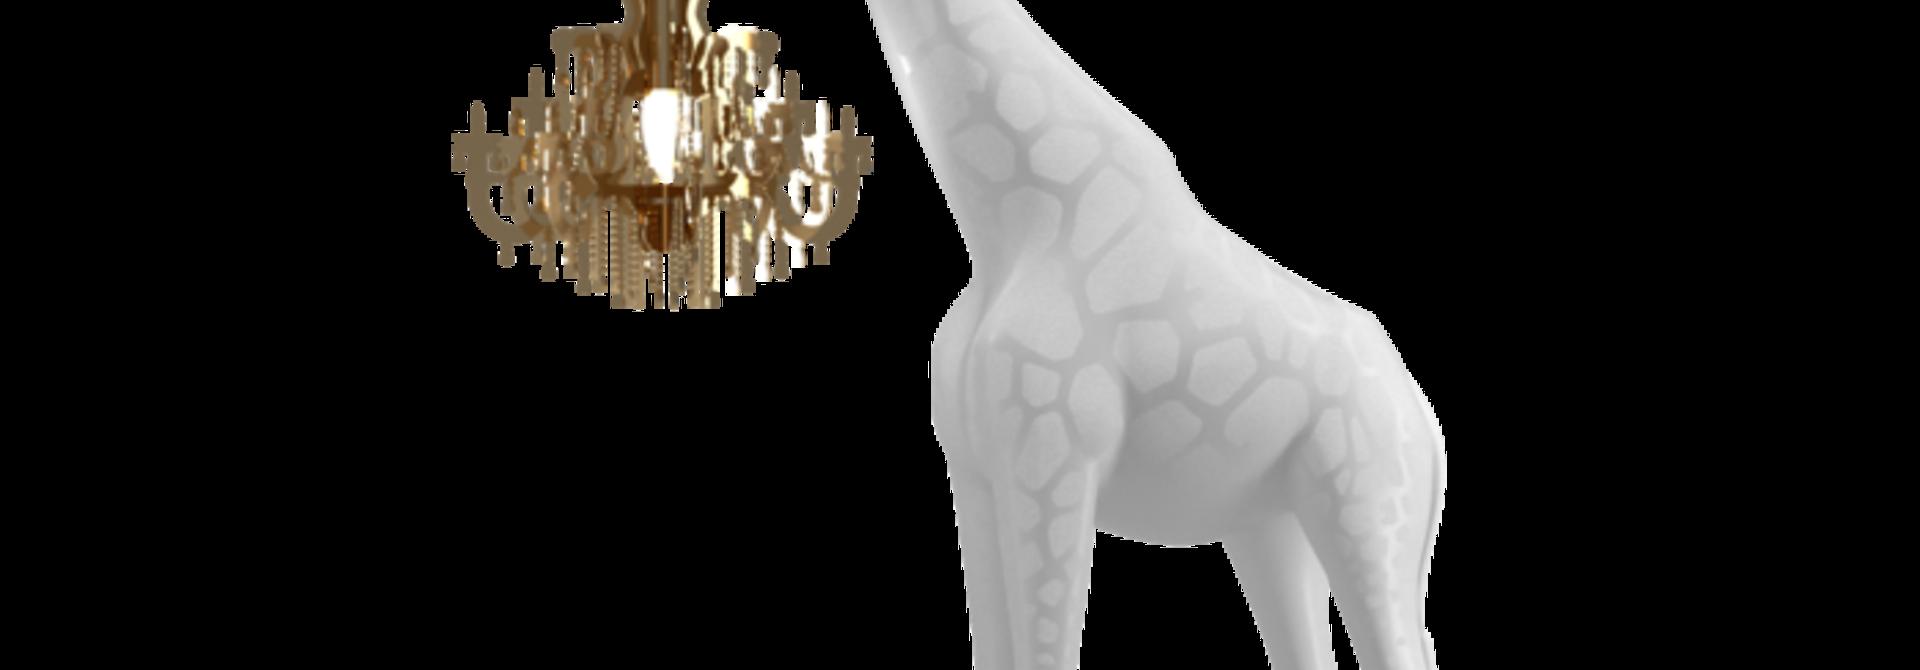 QEEBOO - Giraffe Lamp In Love XS White